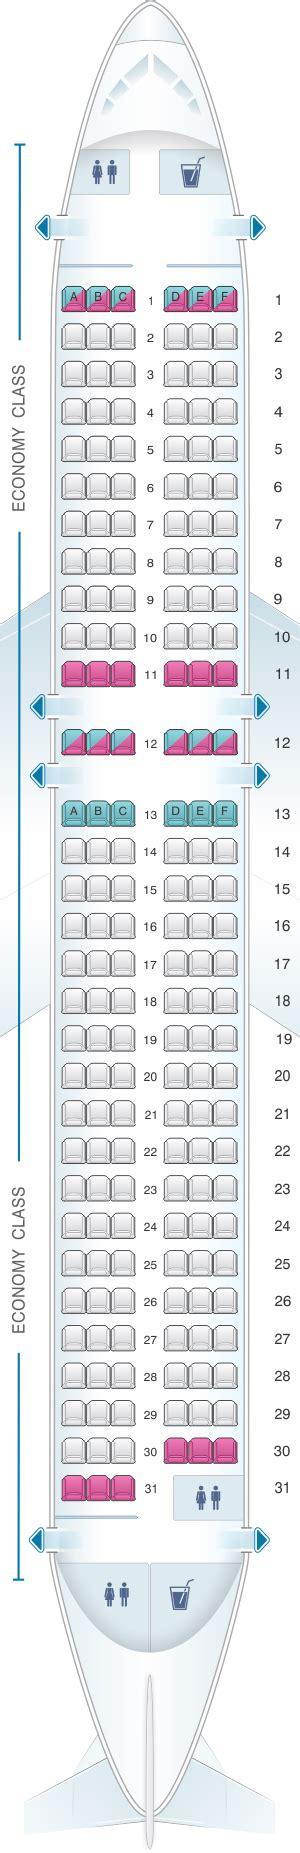 jet seats seat map easyjet airbus a320 seatmaestro